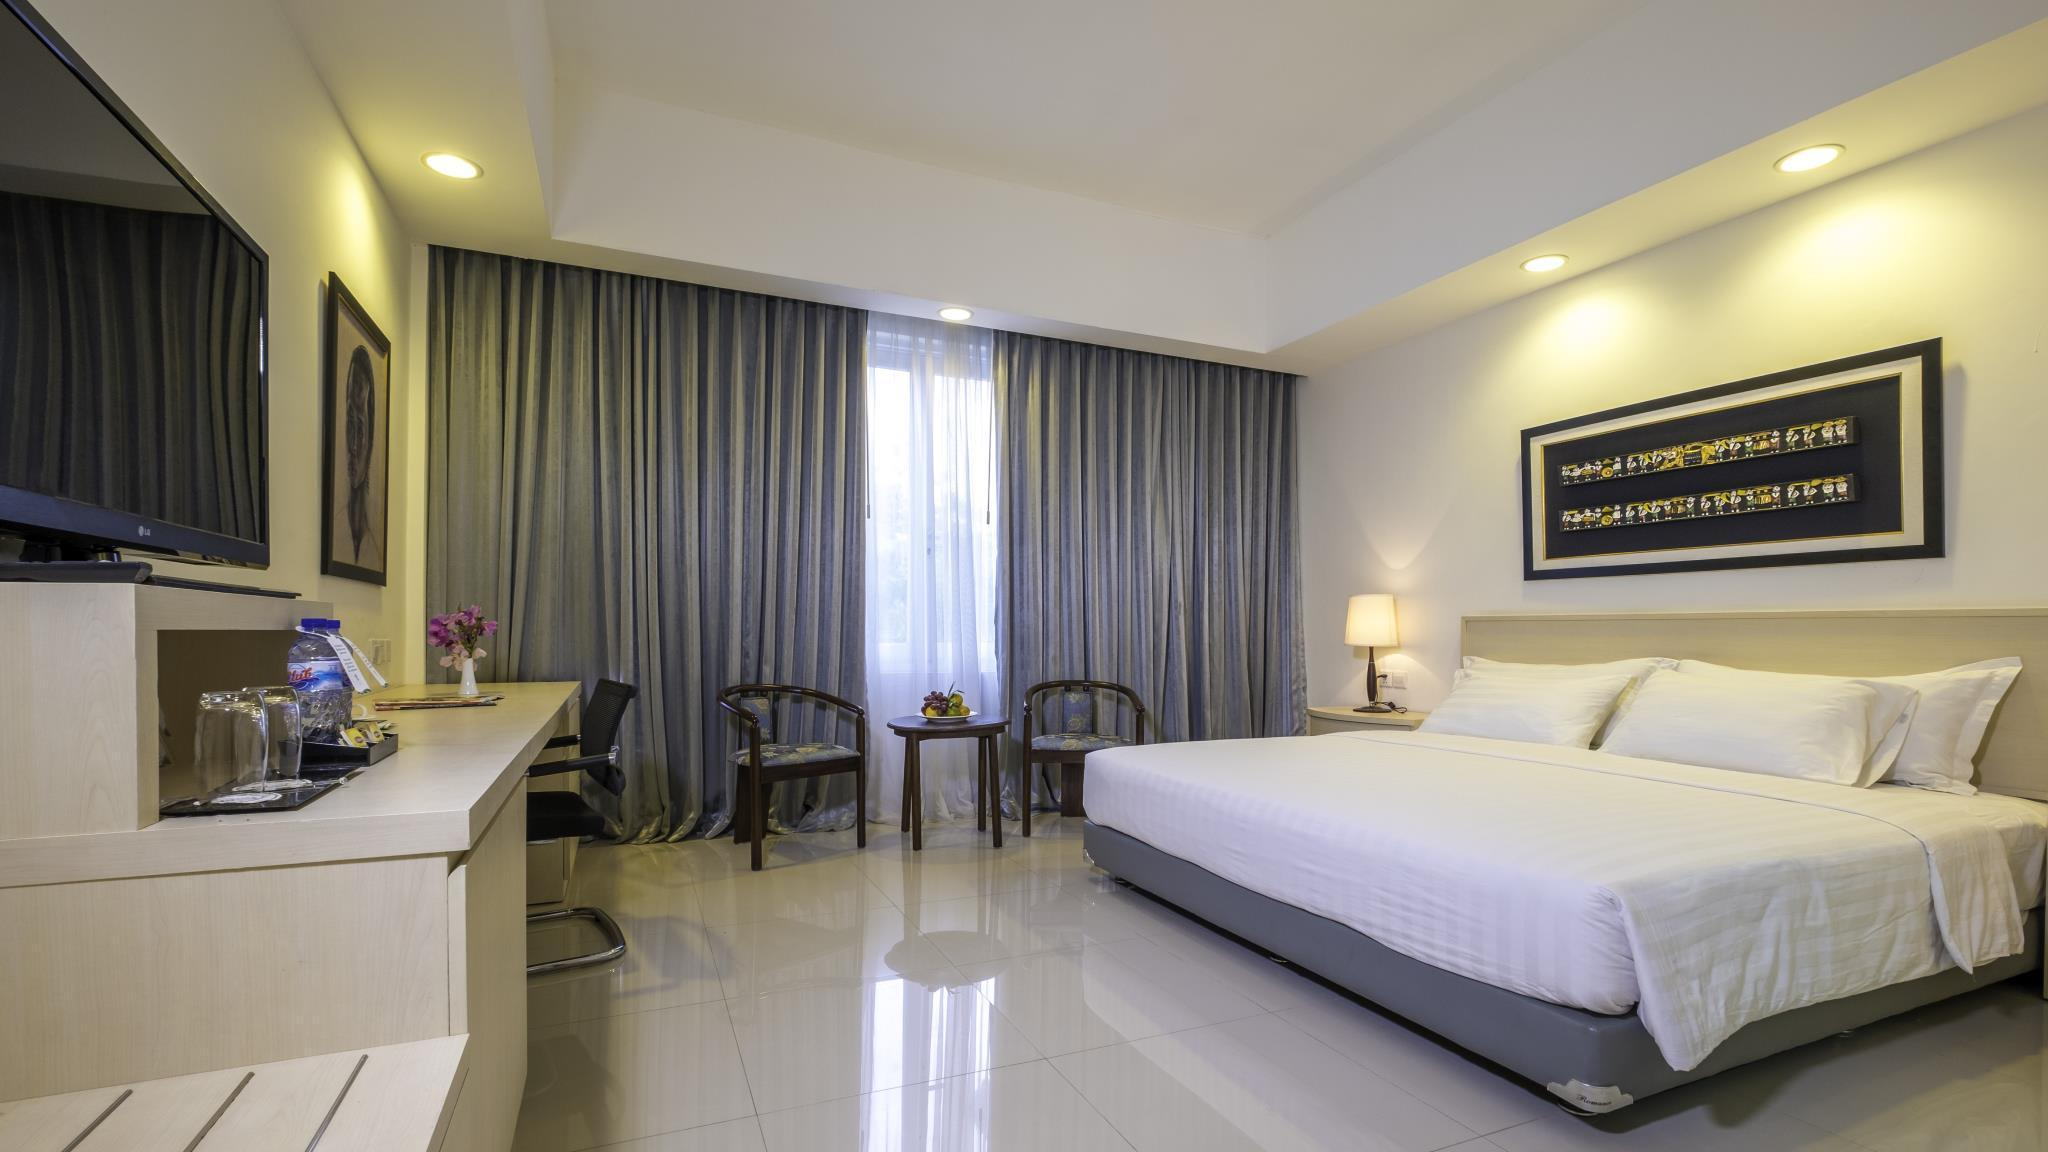 Griya Sintesa Muara Enimmuara Enim Promo Harga Terbaik Hotel Di Manado Deluxe